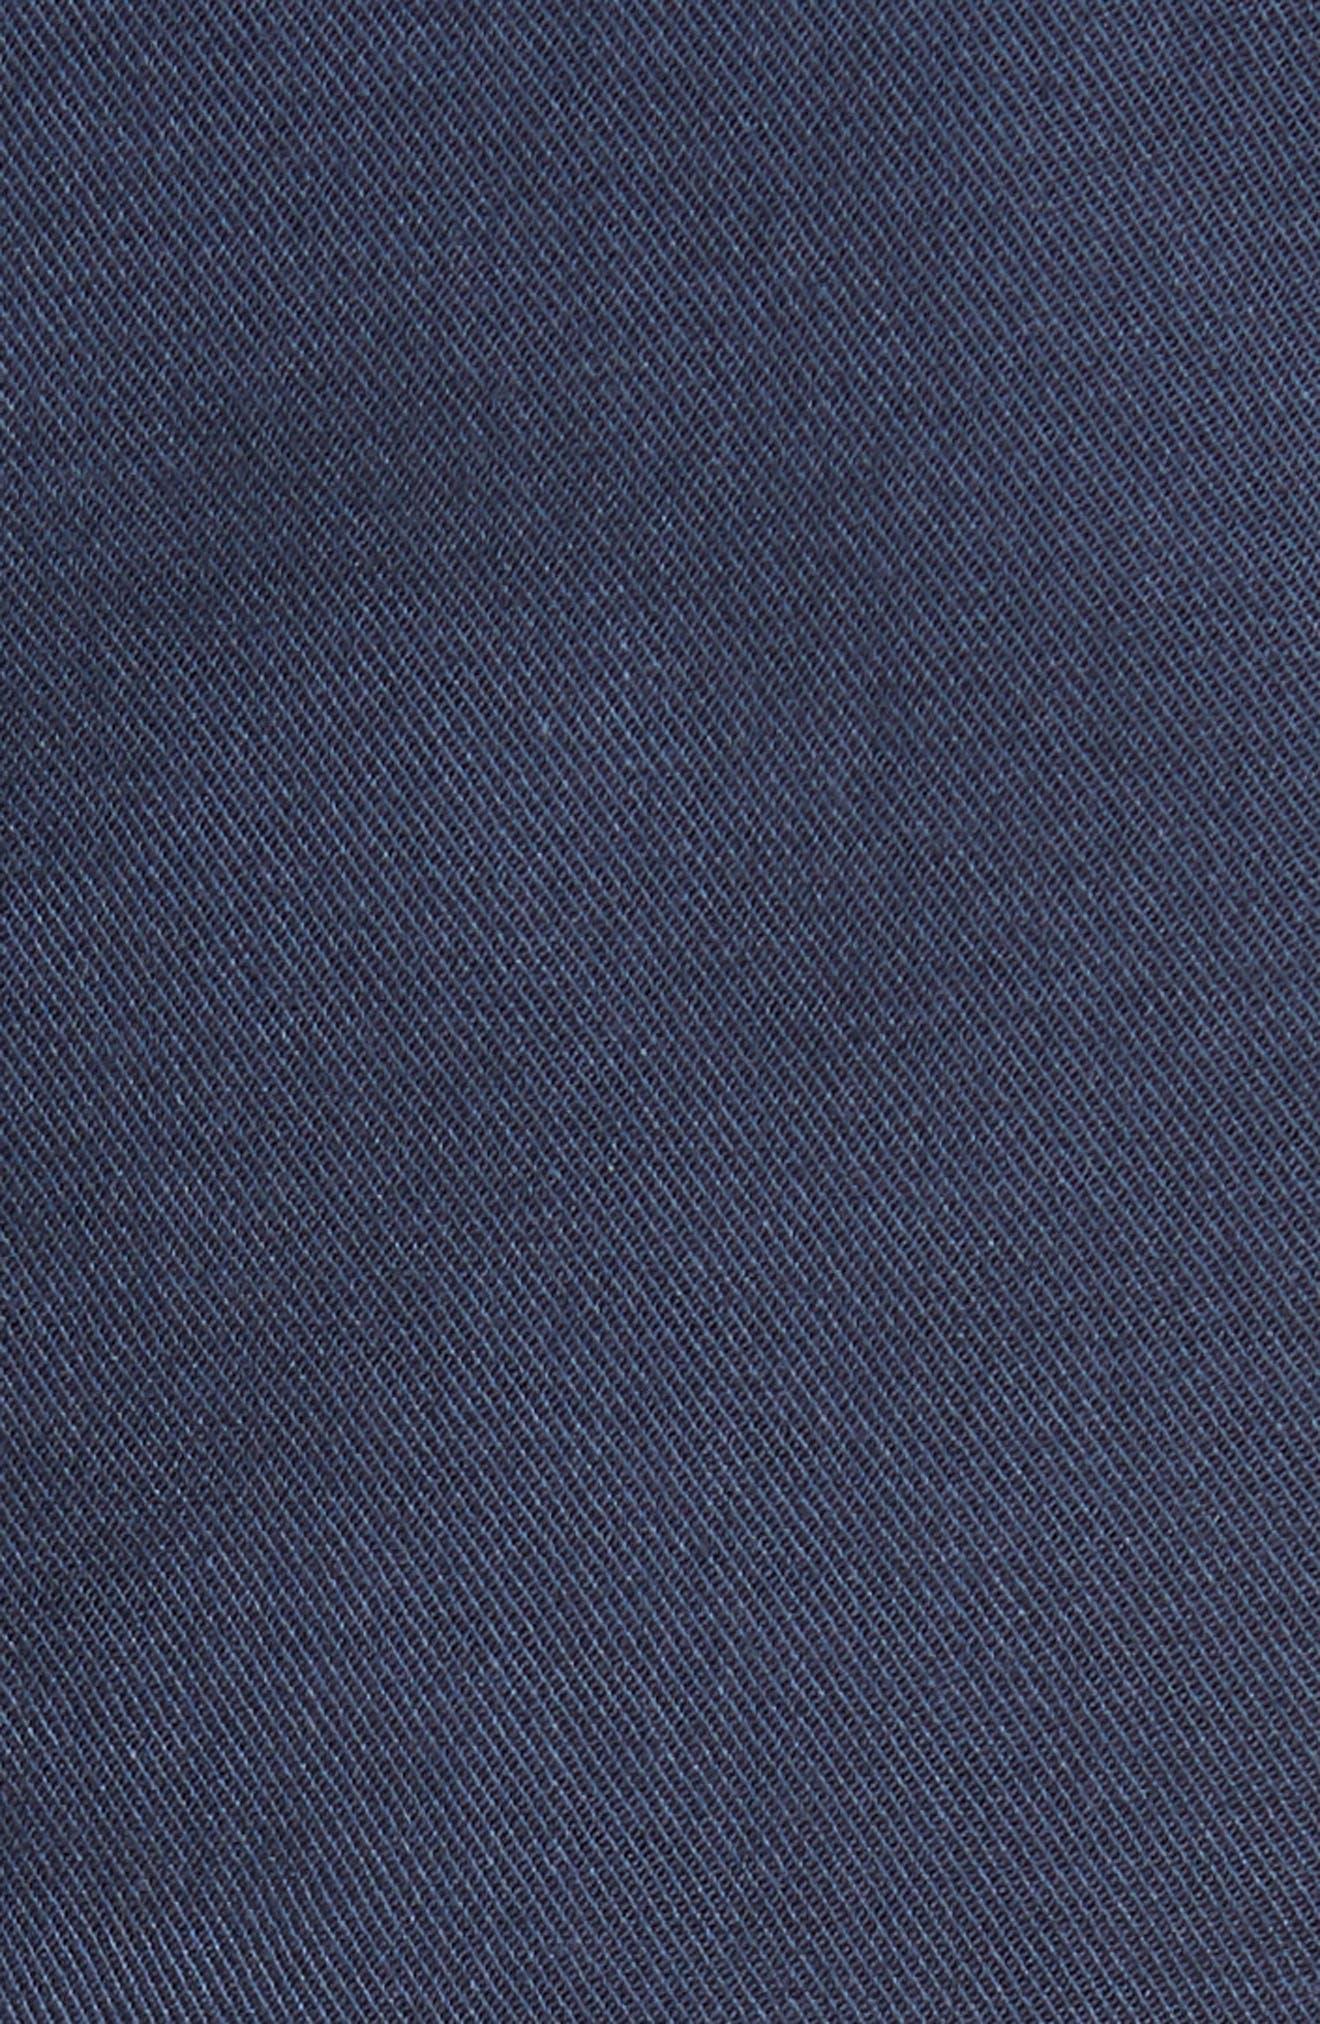 Twill Utility Skirt,                             Alternate thumbnail 5, color,                             Navy Indigo